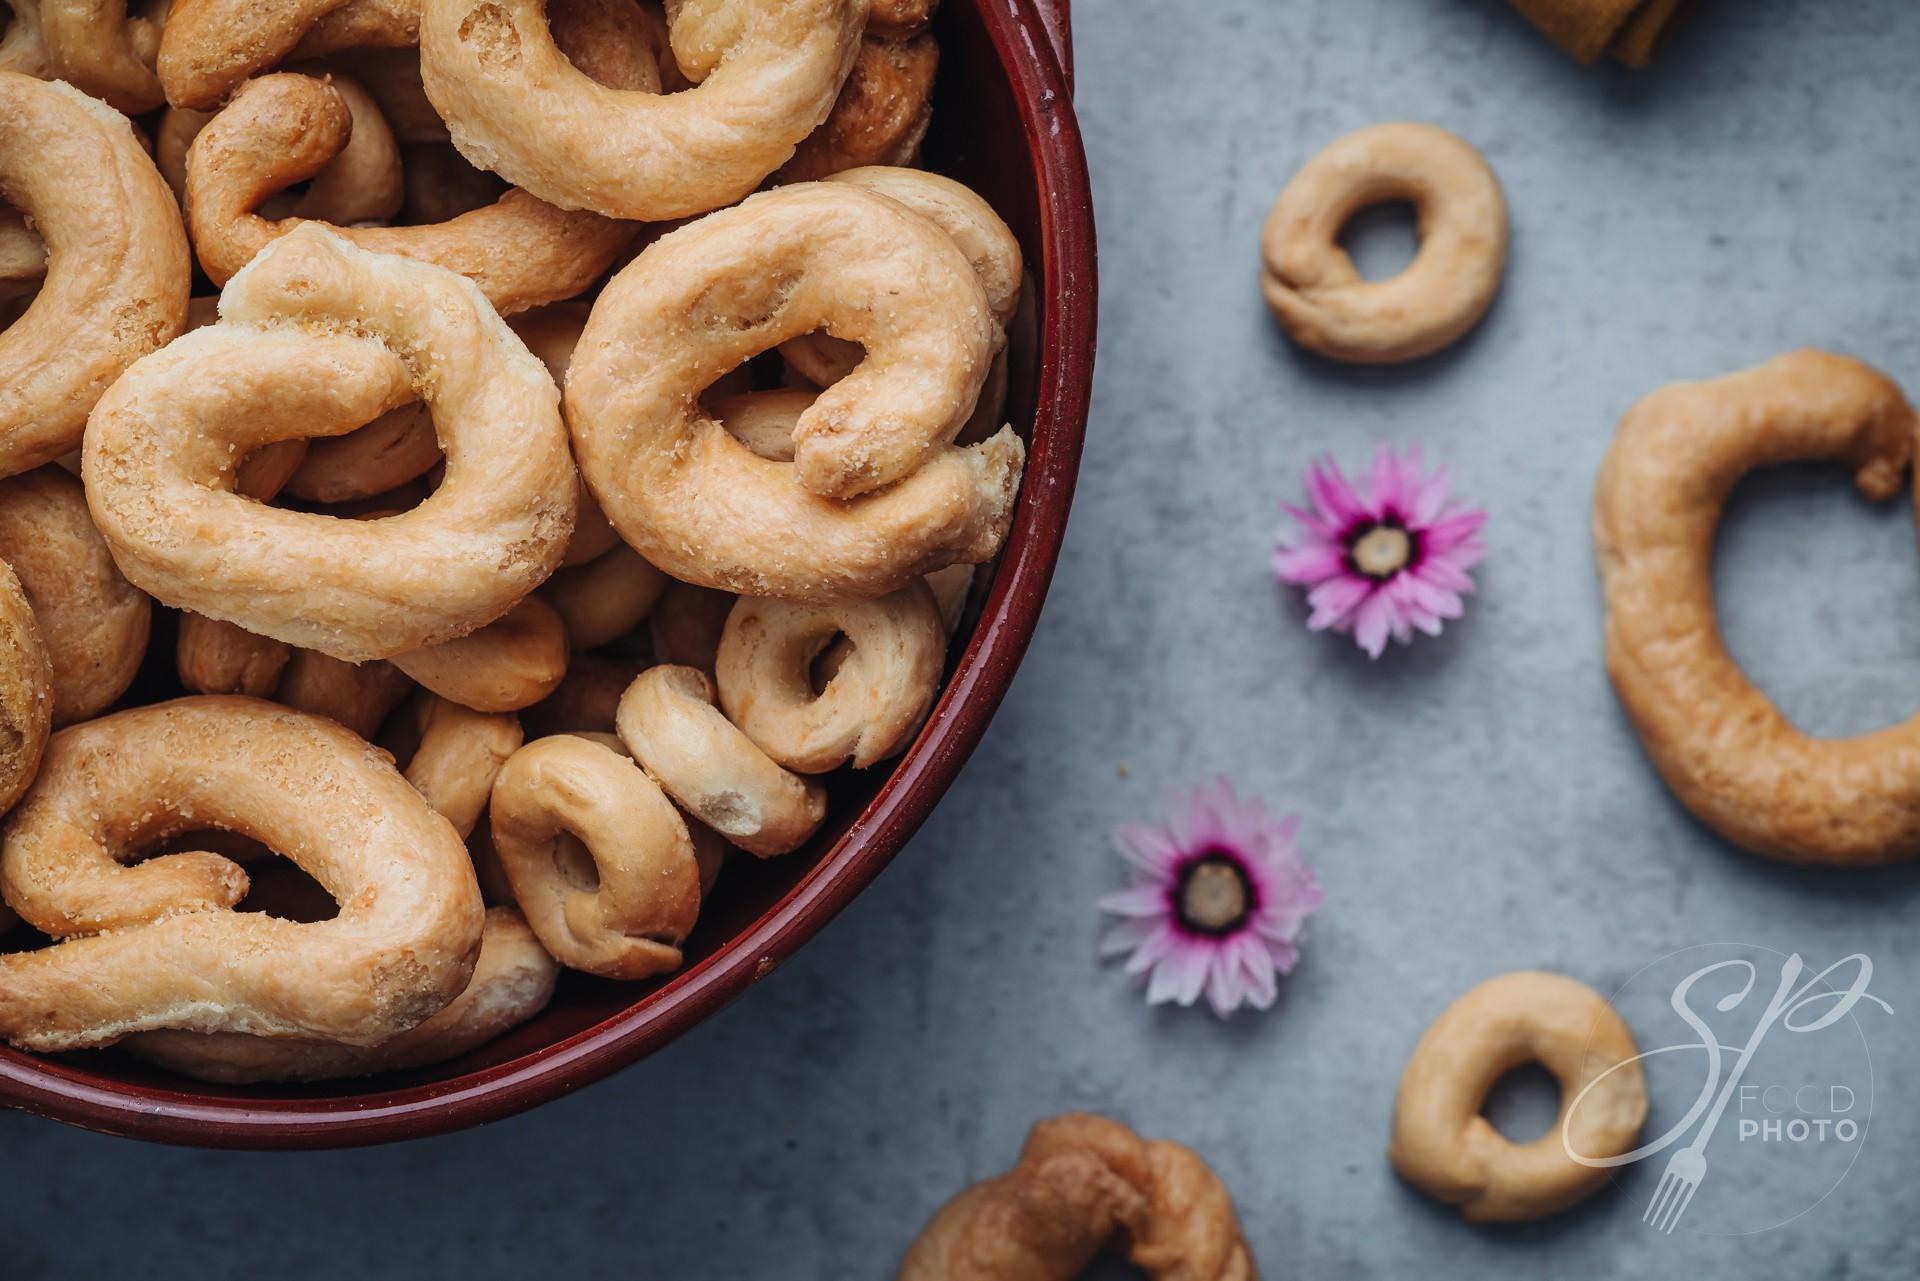 Crunchy traditional taralli snacks from Puglia